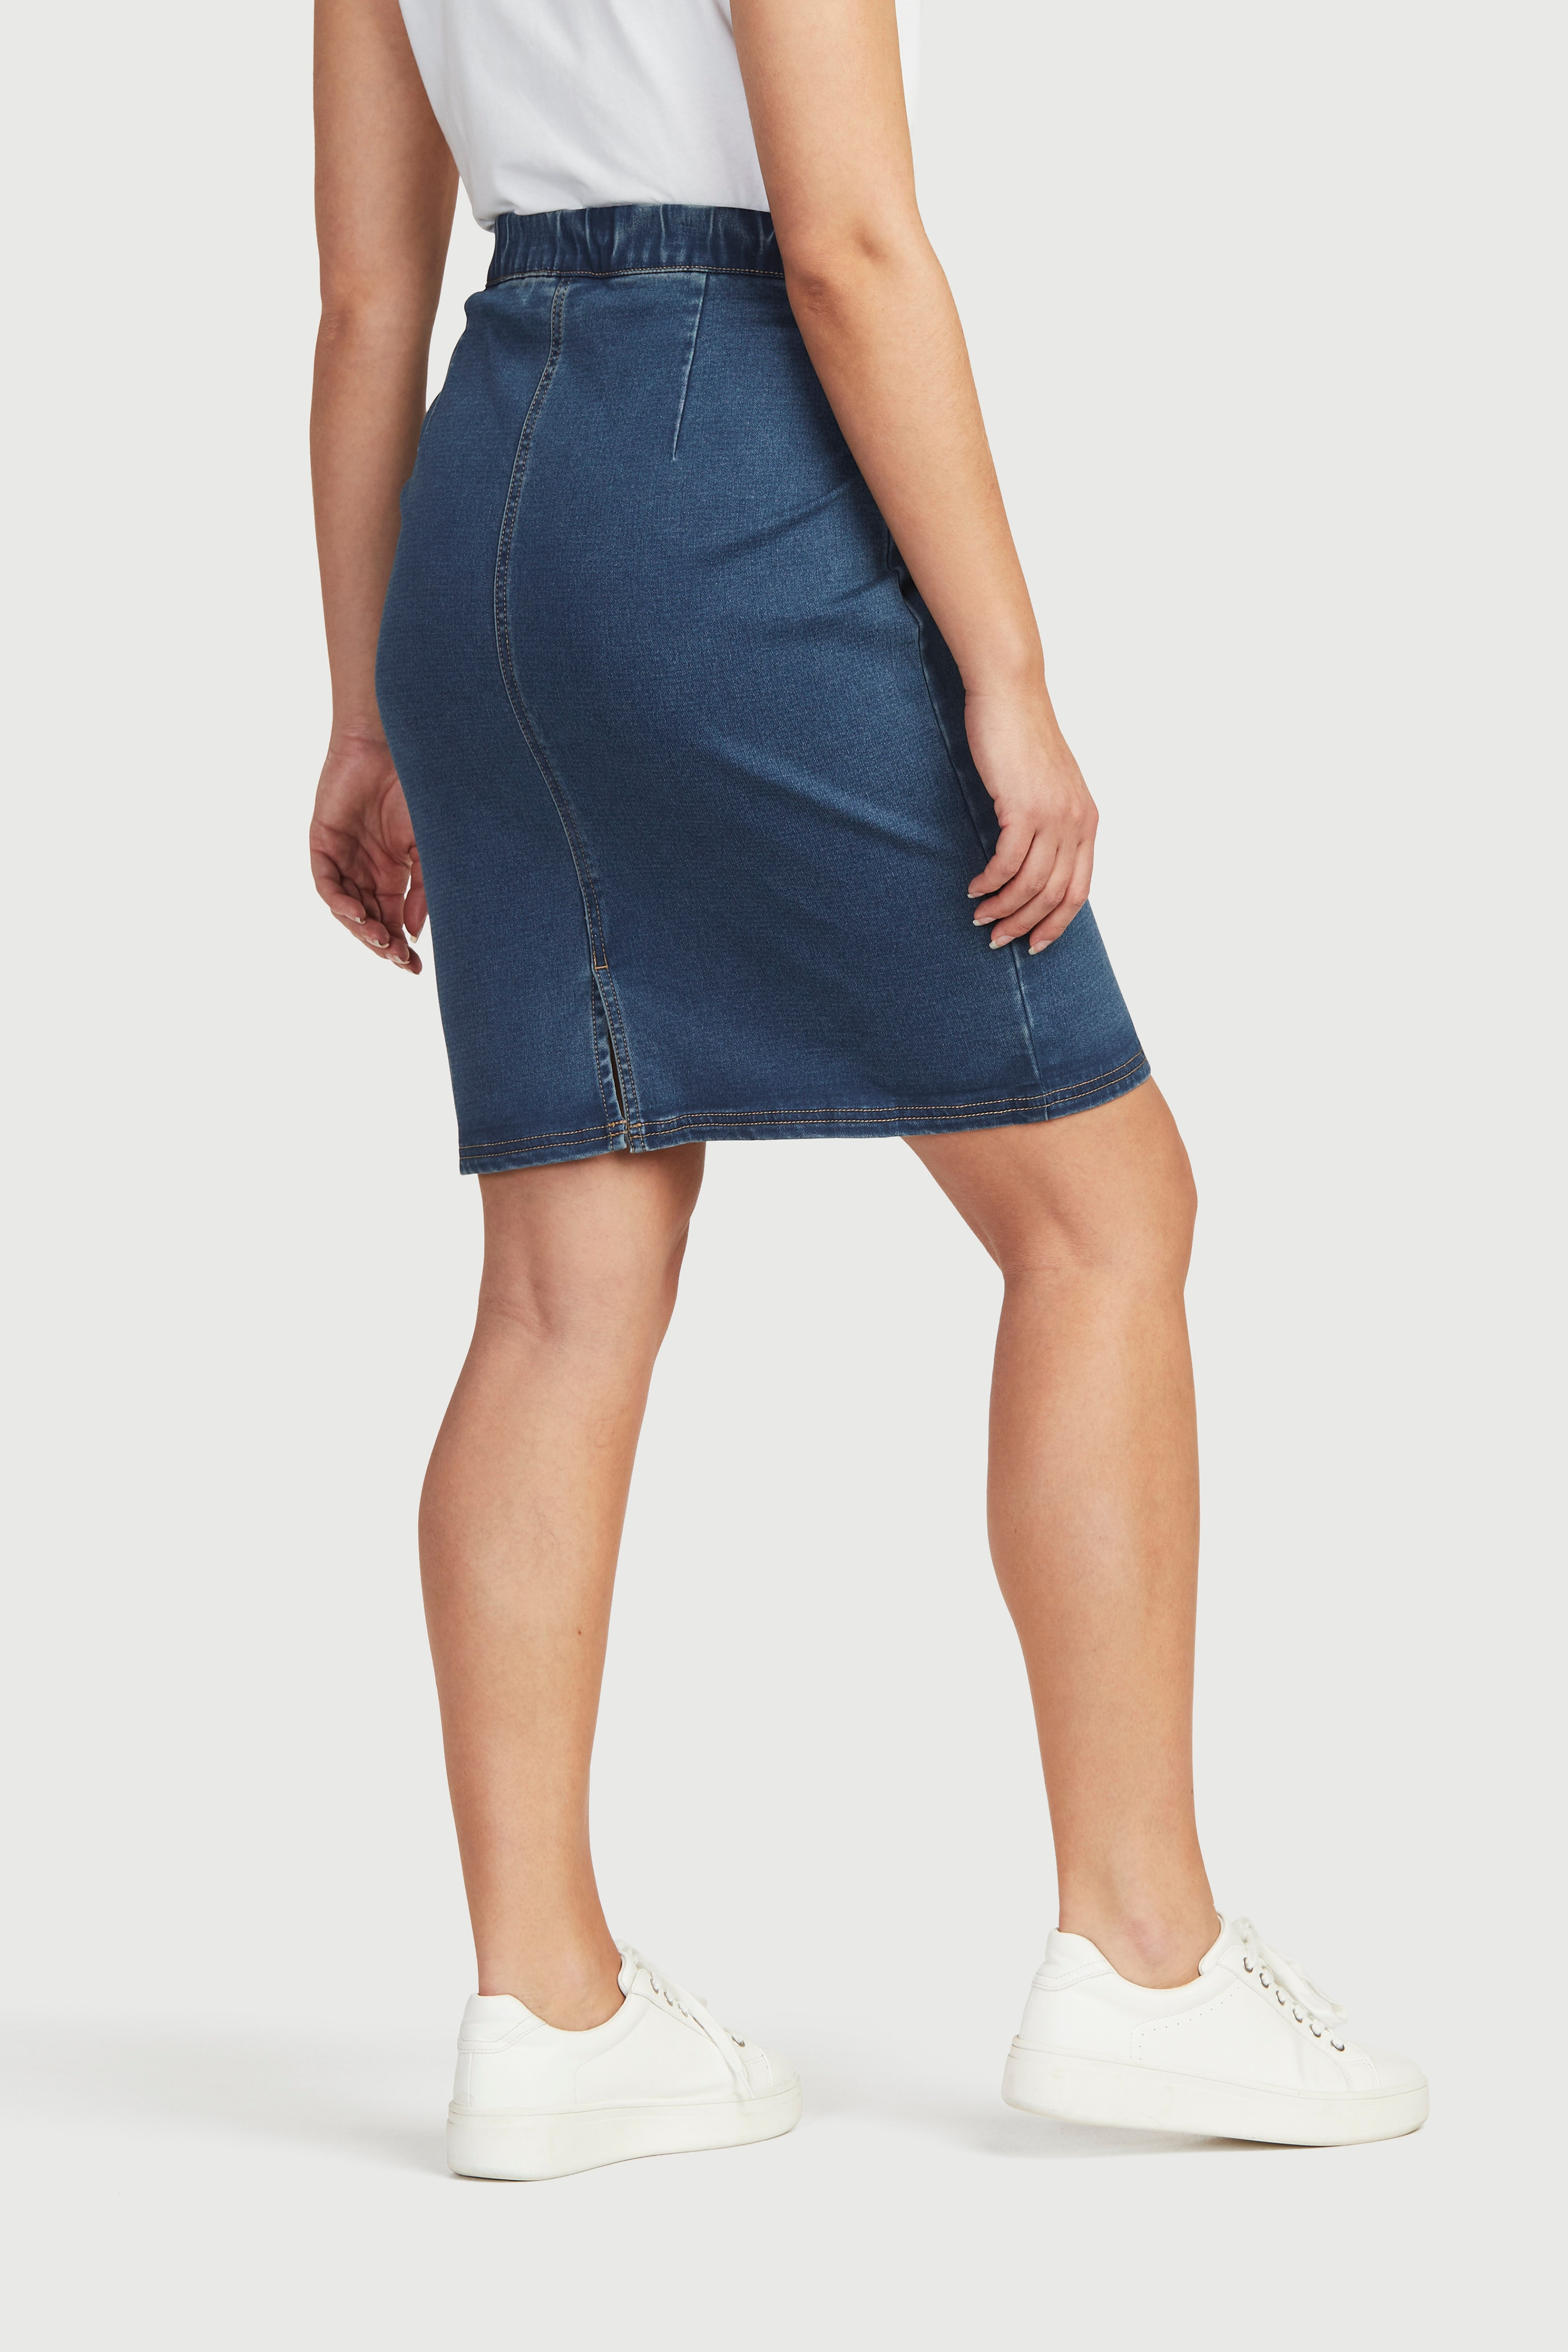 Kort jeanskjol